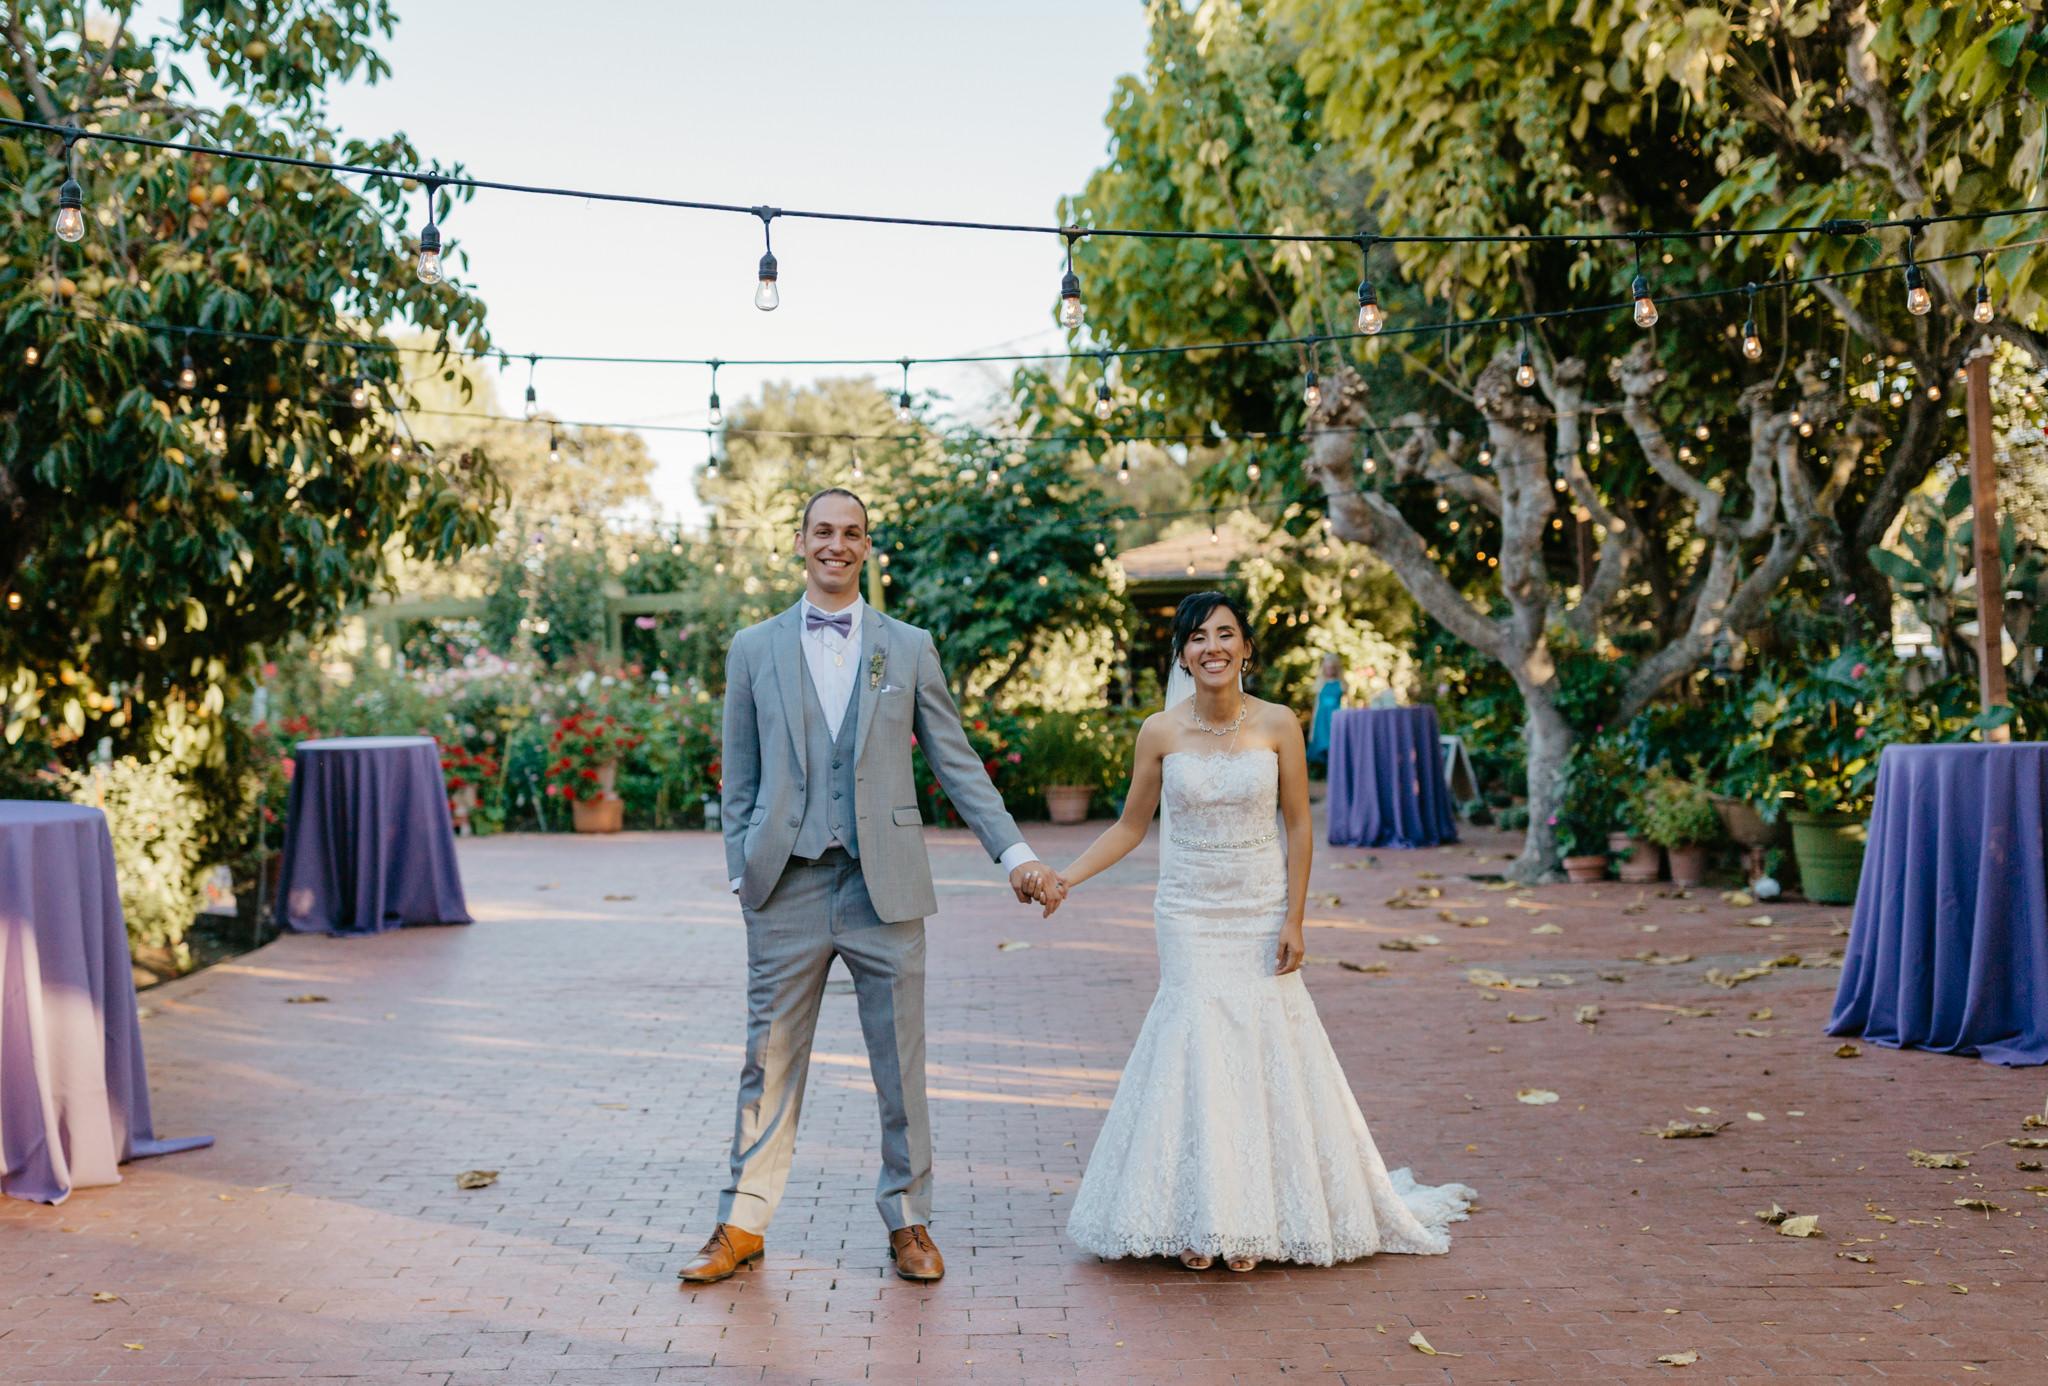 Jardines Outdoor Garden Wedding Reception Bride Groom